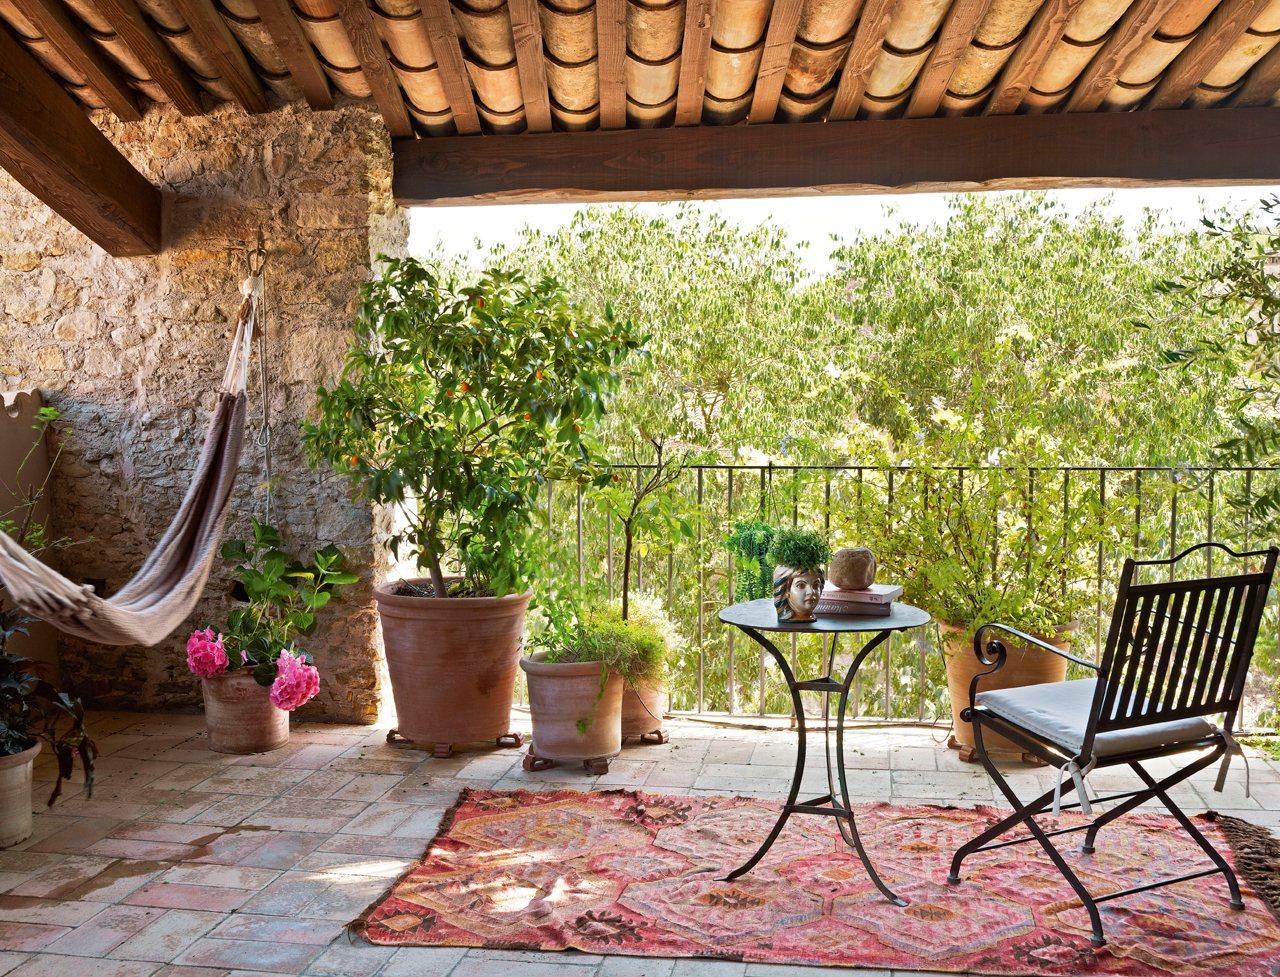 15 formas de aprovechar exteriores peque os for Hamacas para el jardin